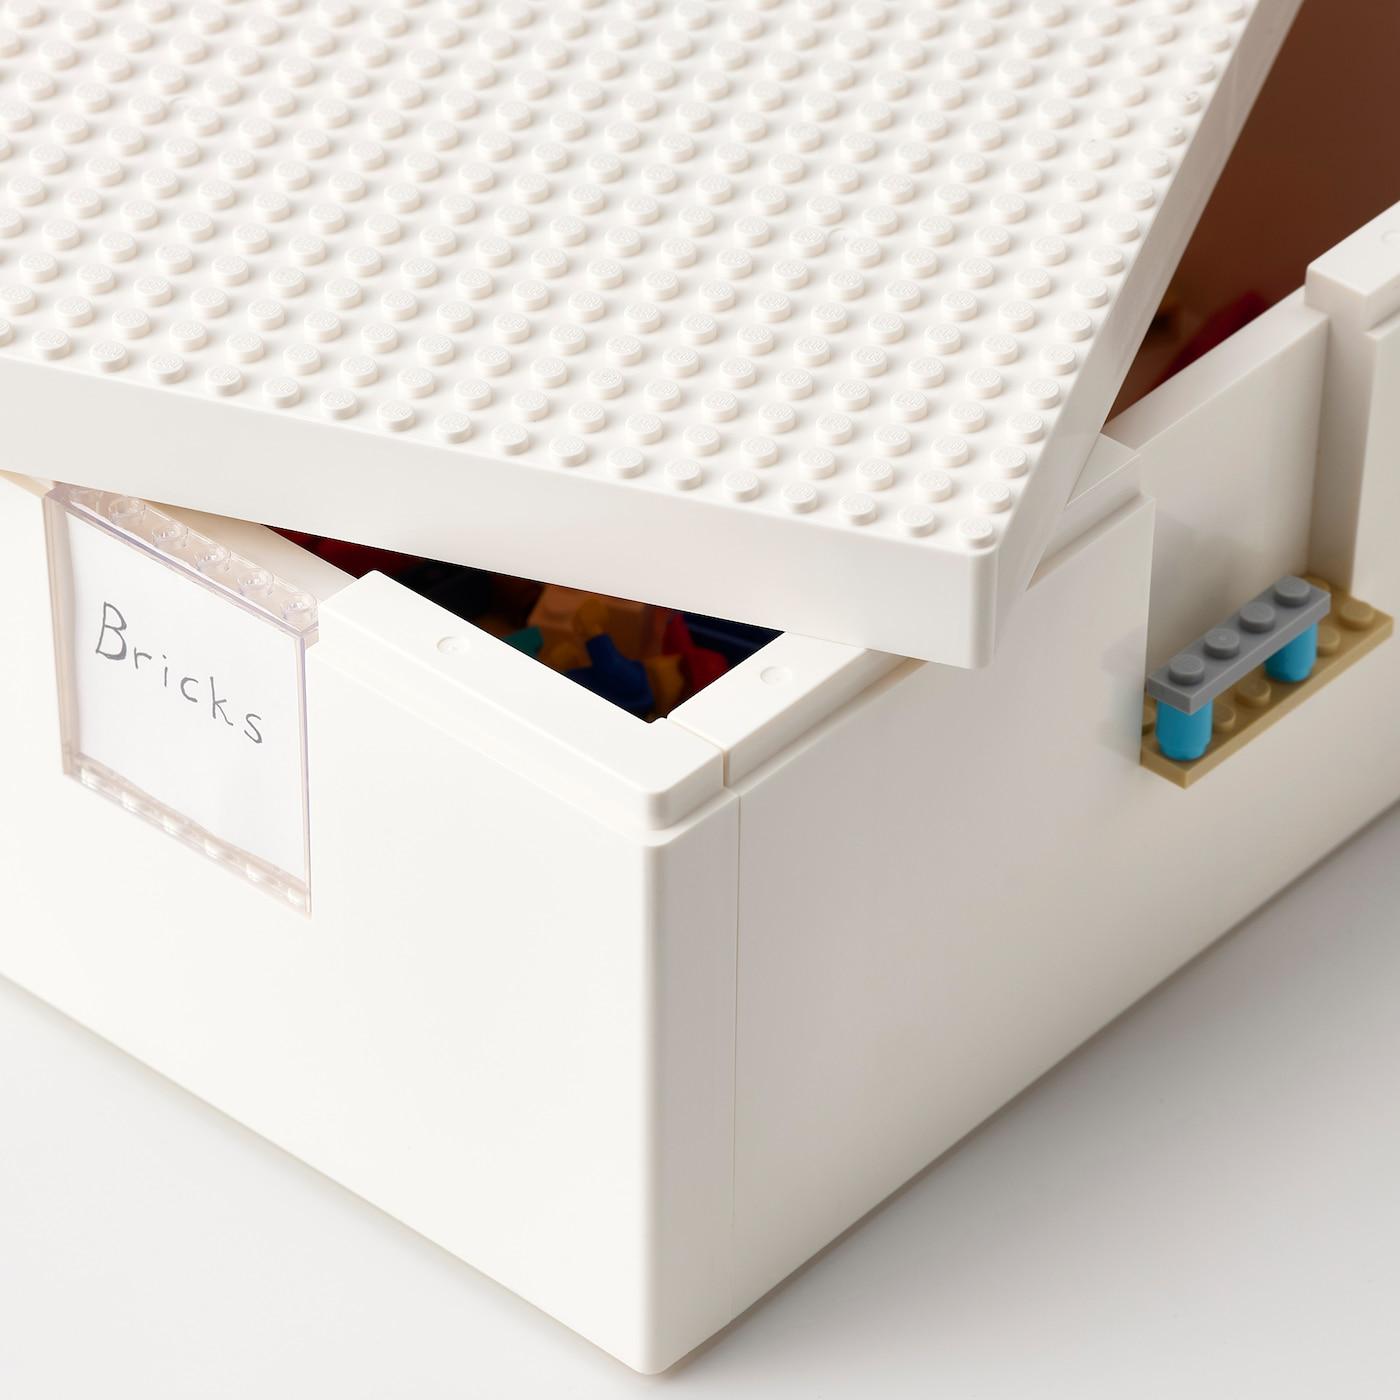 "BYGGLEK LEGO® box with lid, white, 10x6 7/8x4 1/2 """